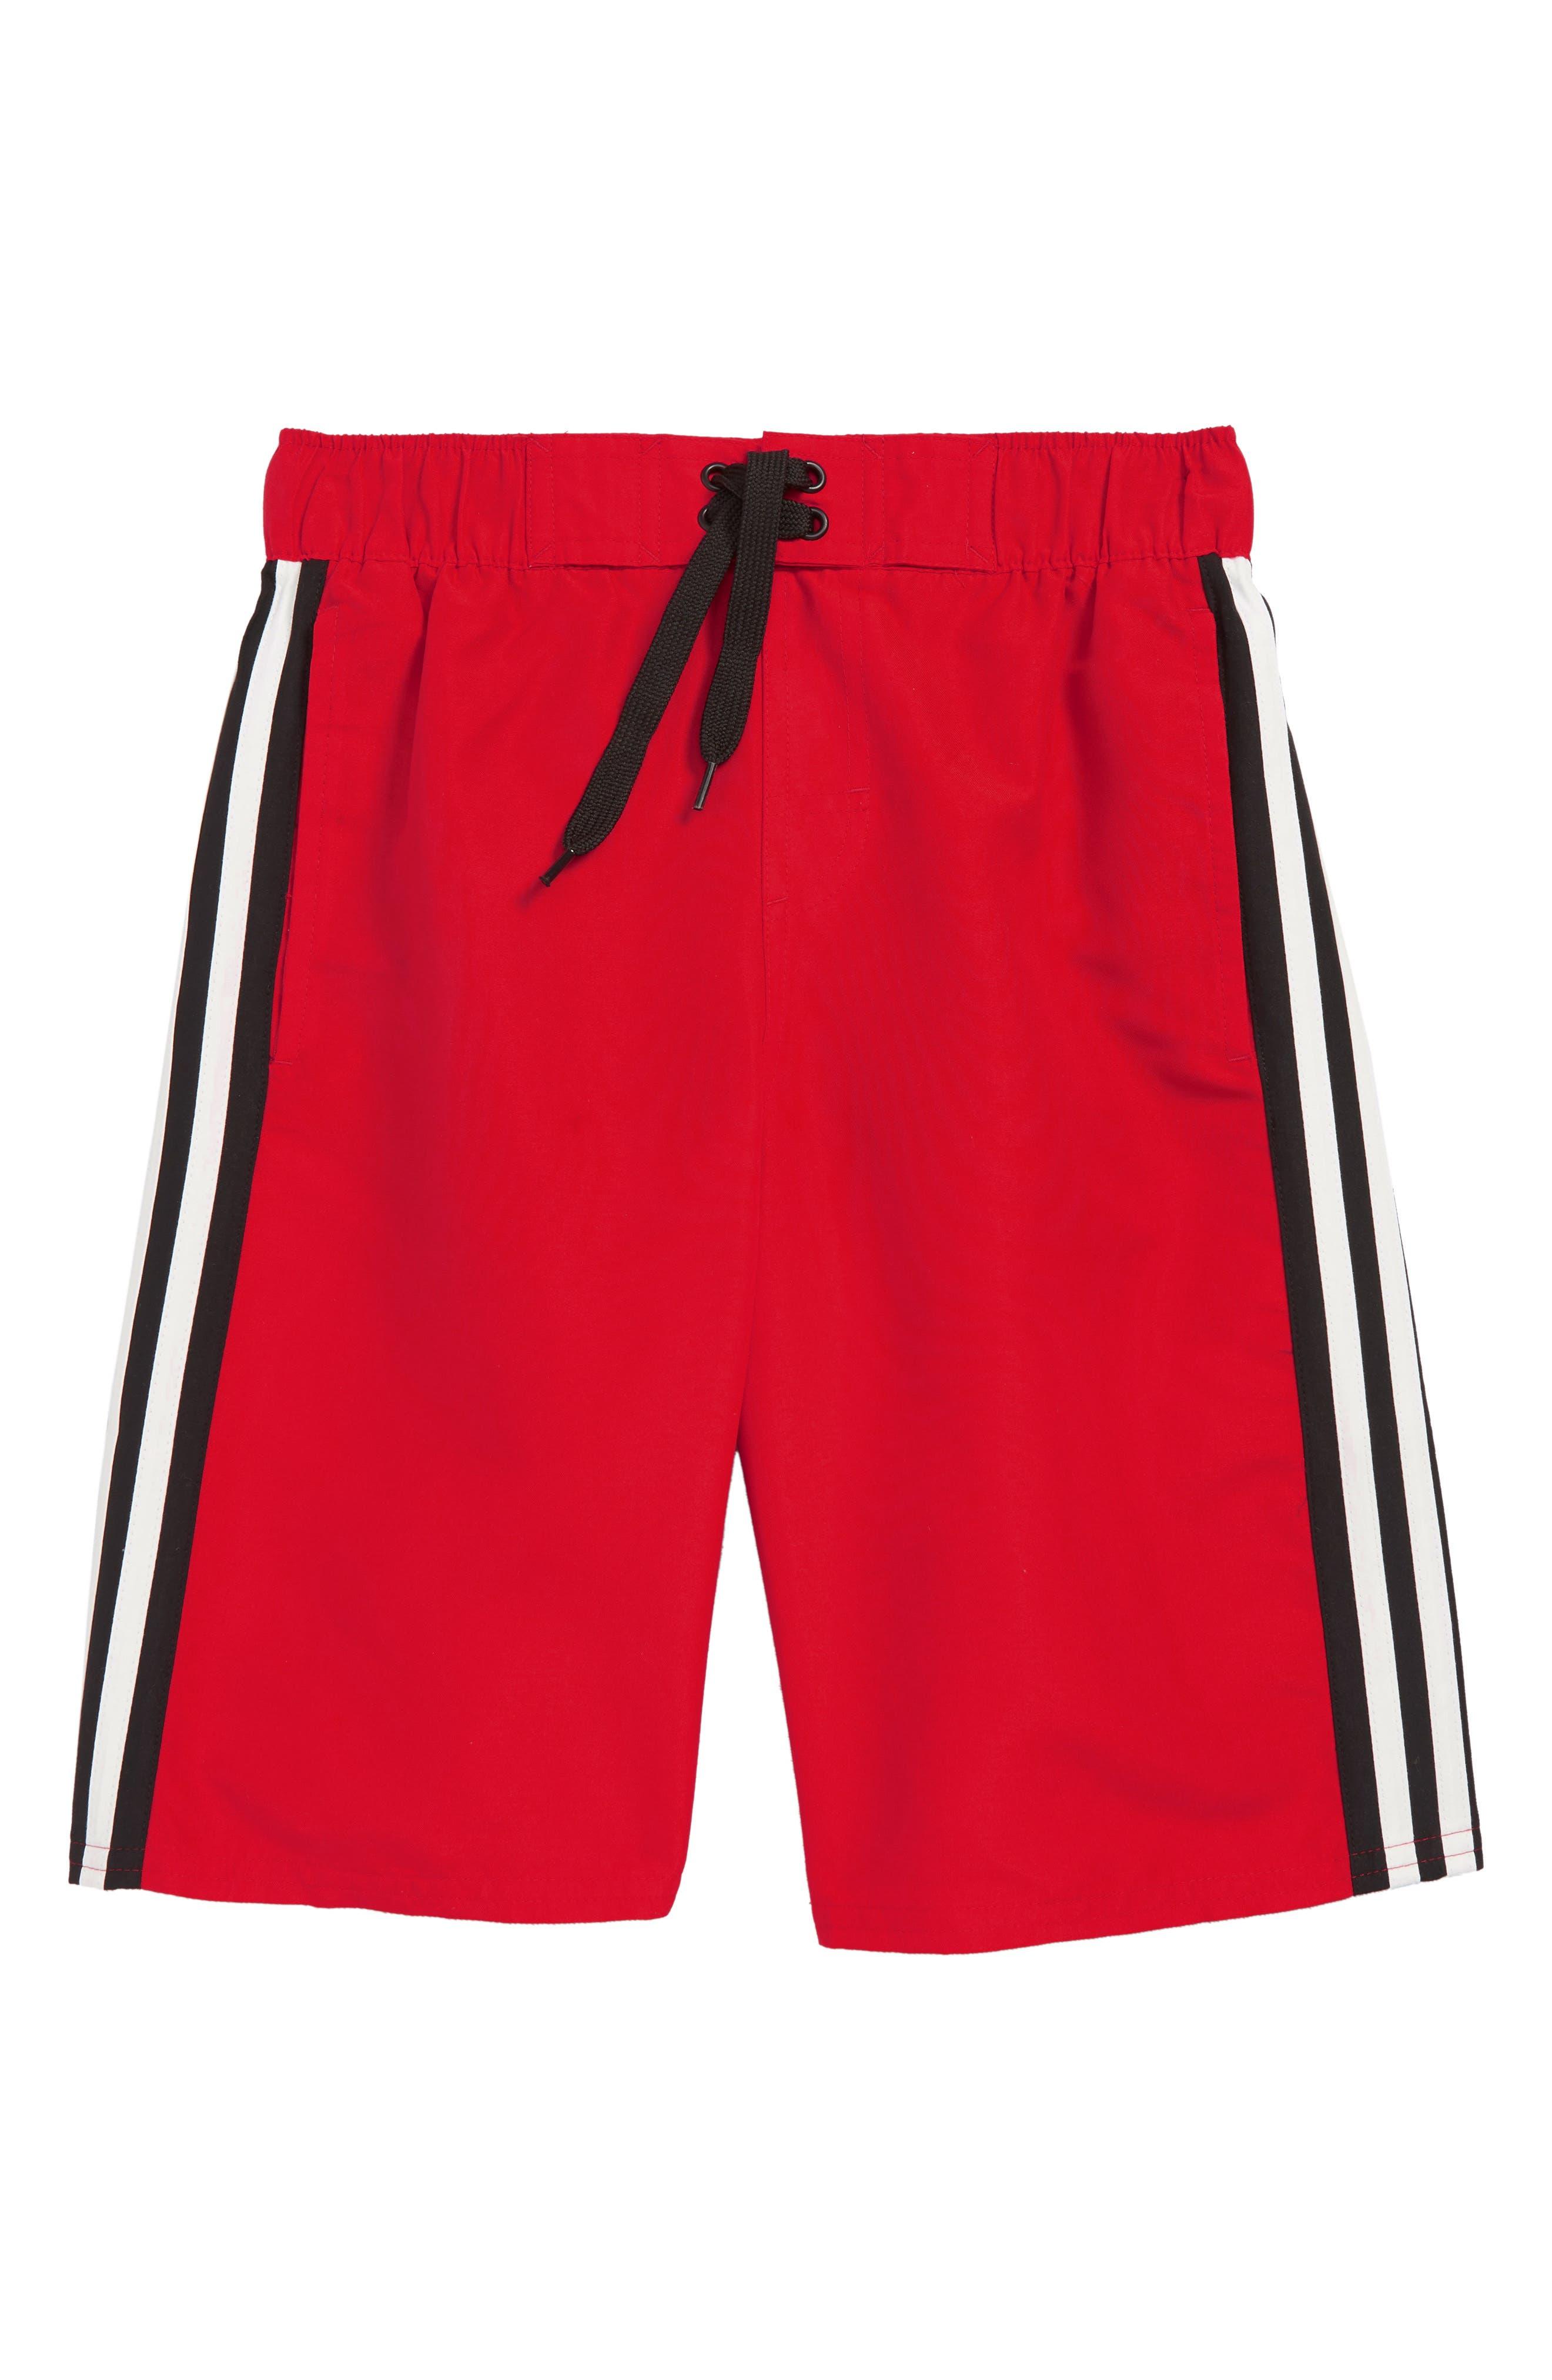 ADIDAS ORIGINALS Iconic 3.0 Volley Swim Trunks, Main, color, RED